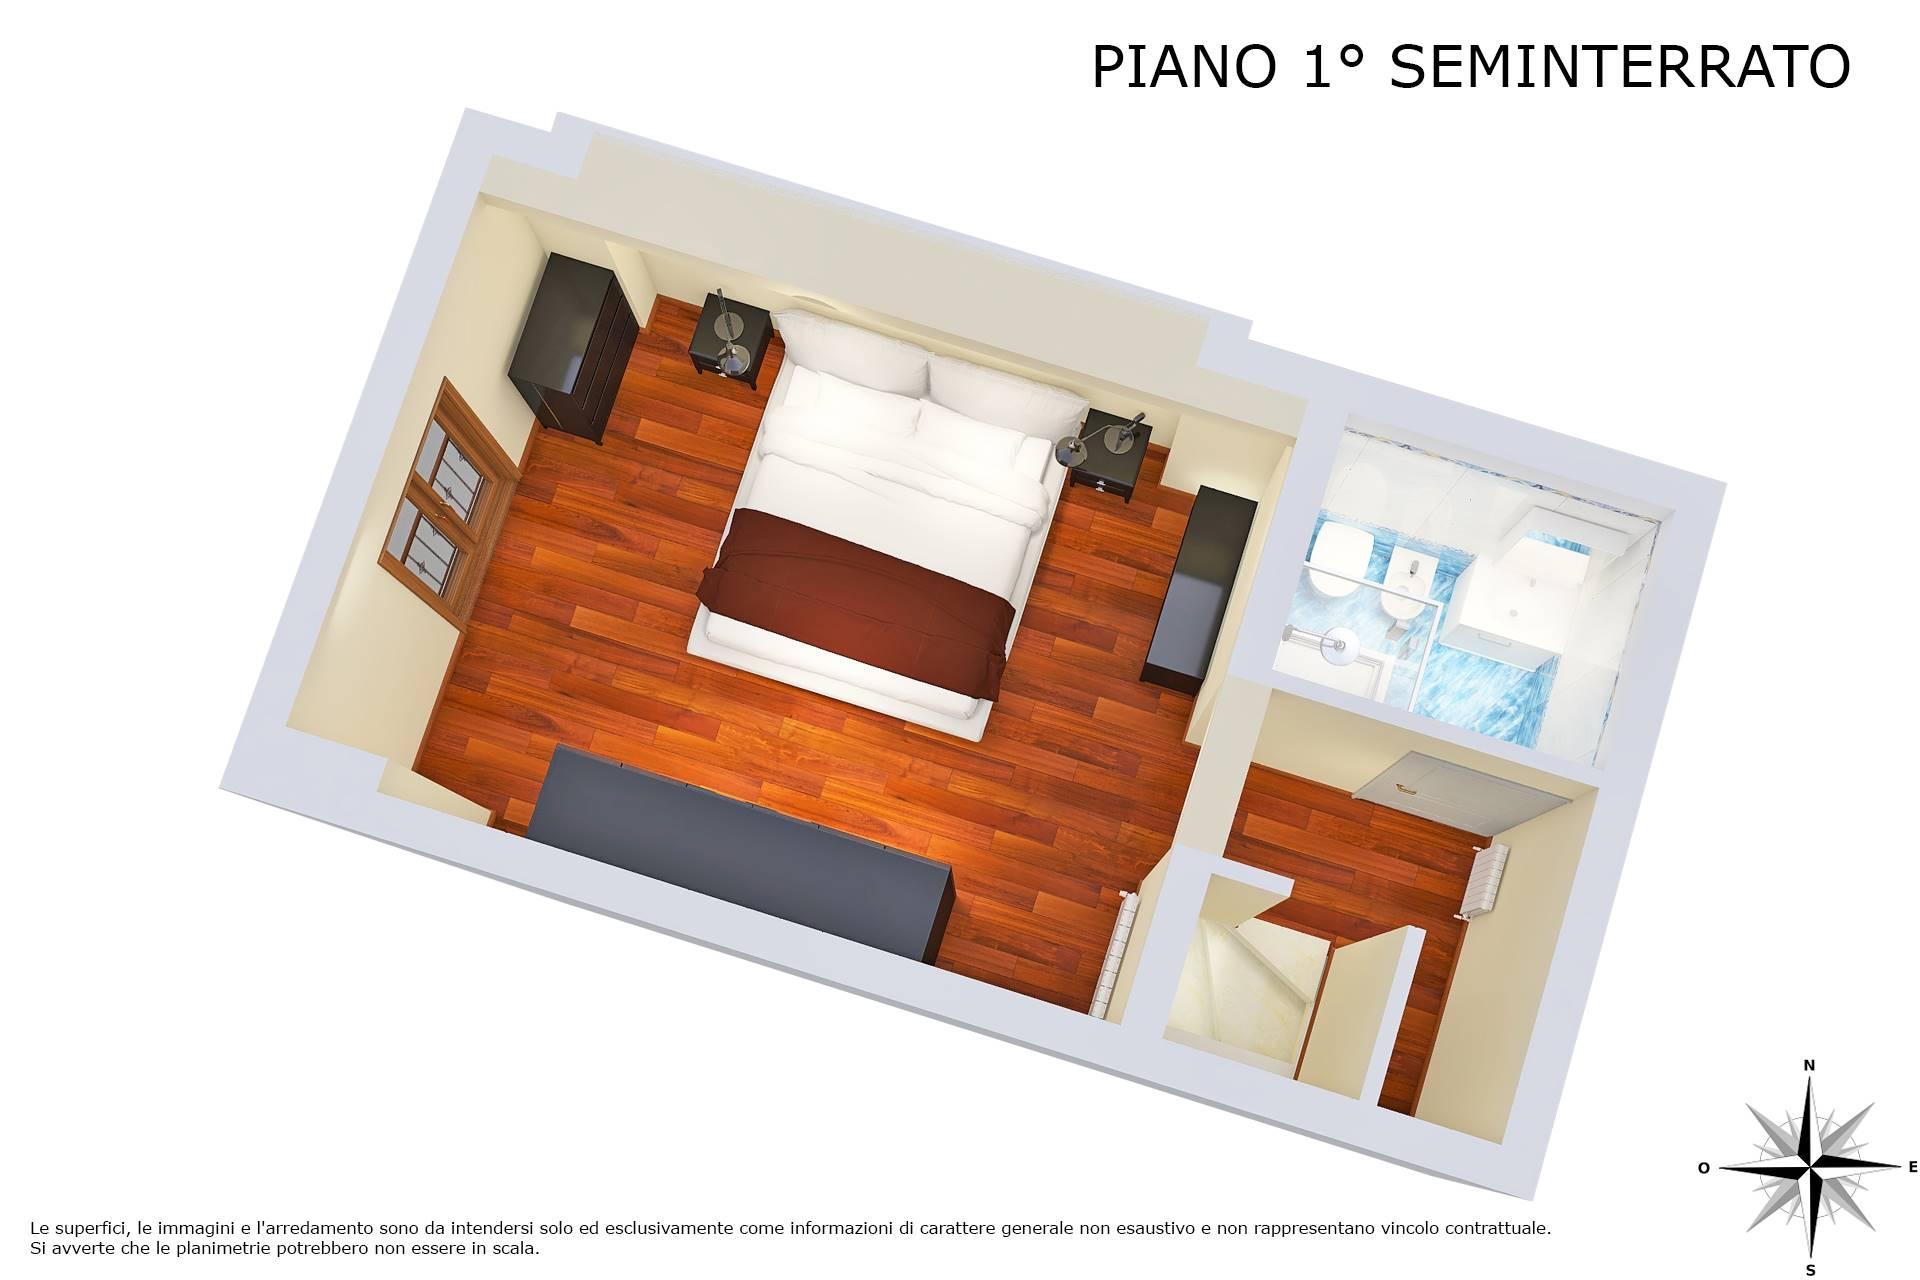 Planimetria 3D piano 1° seminterrato